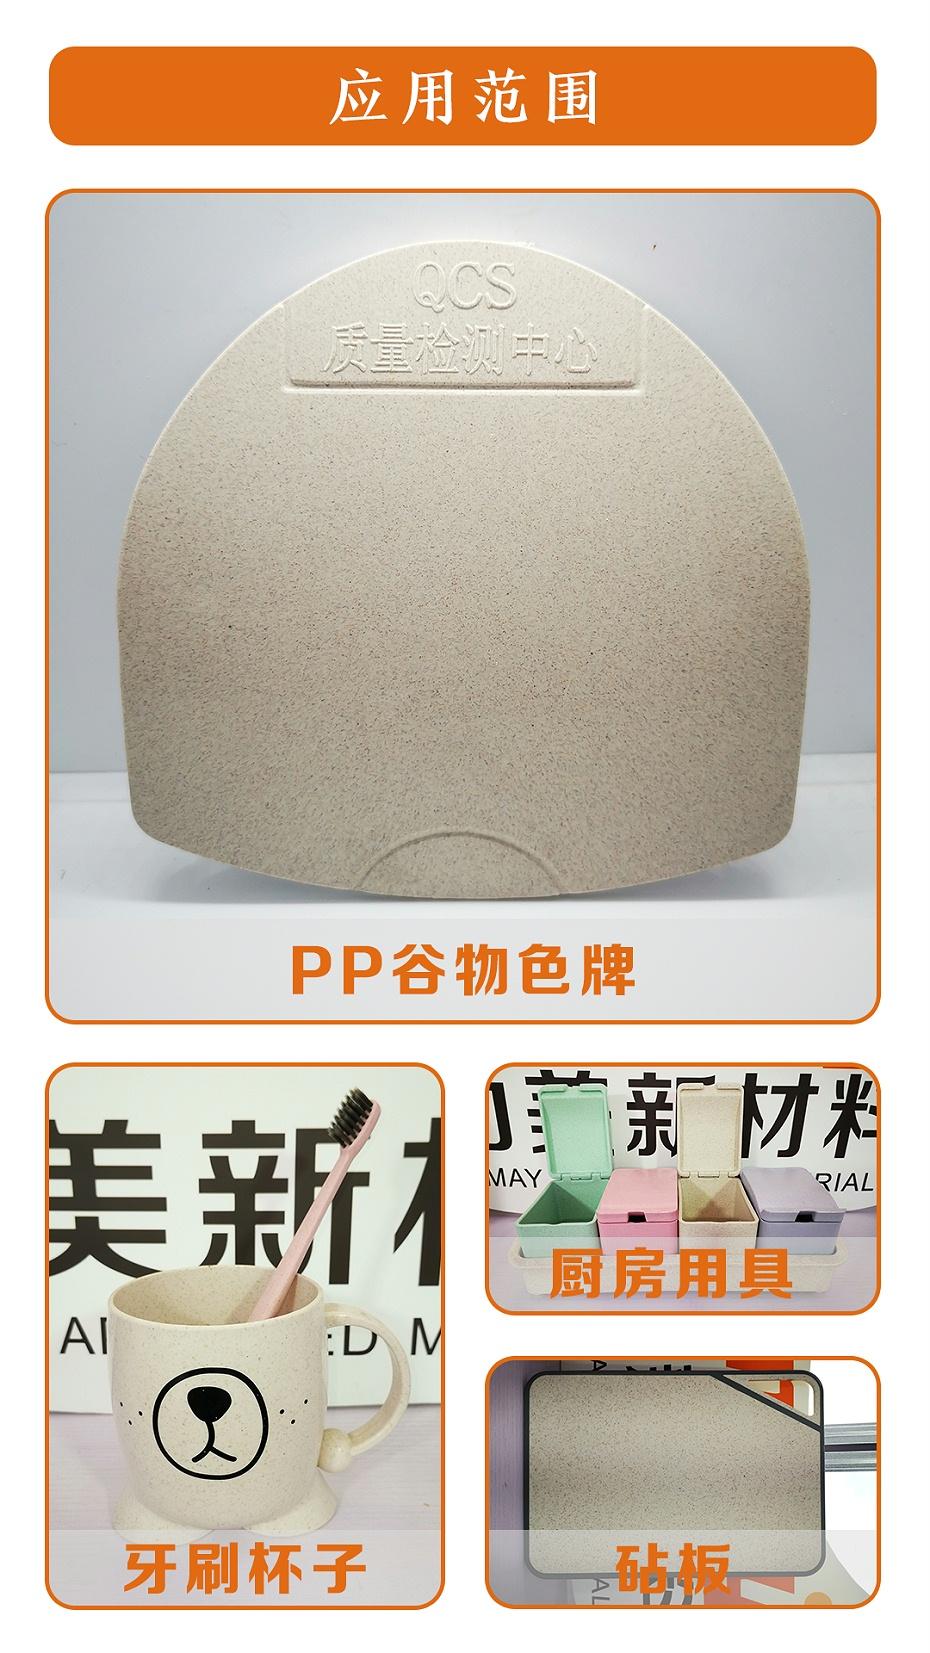 PP谷物纤维应用图片